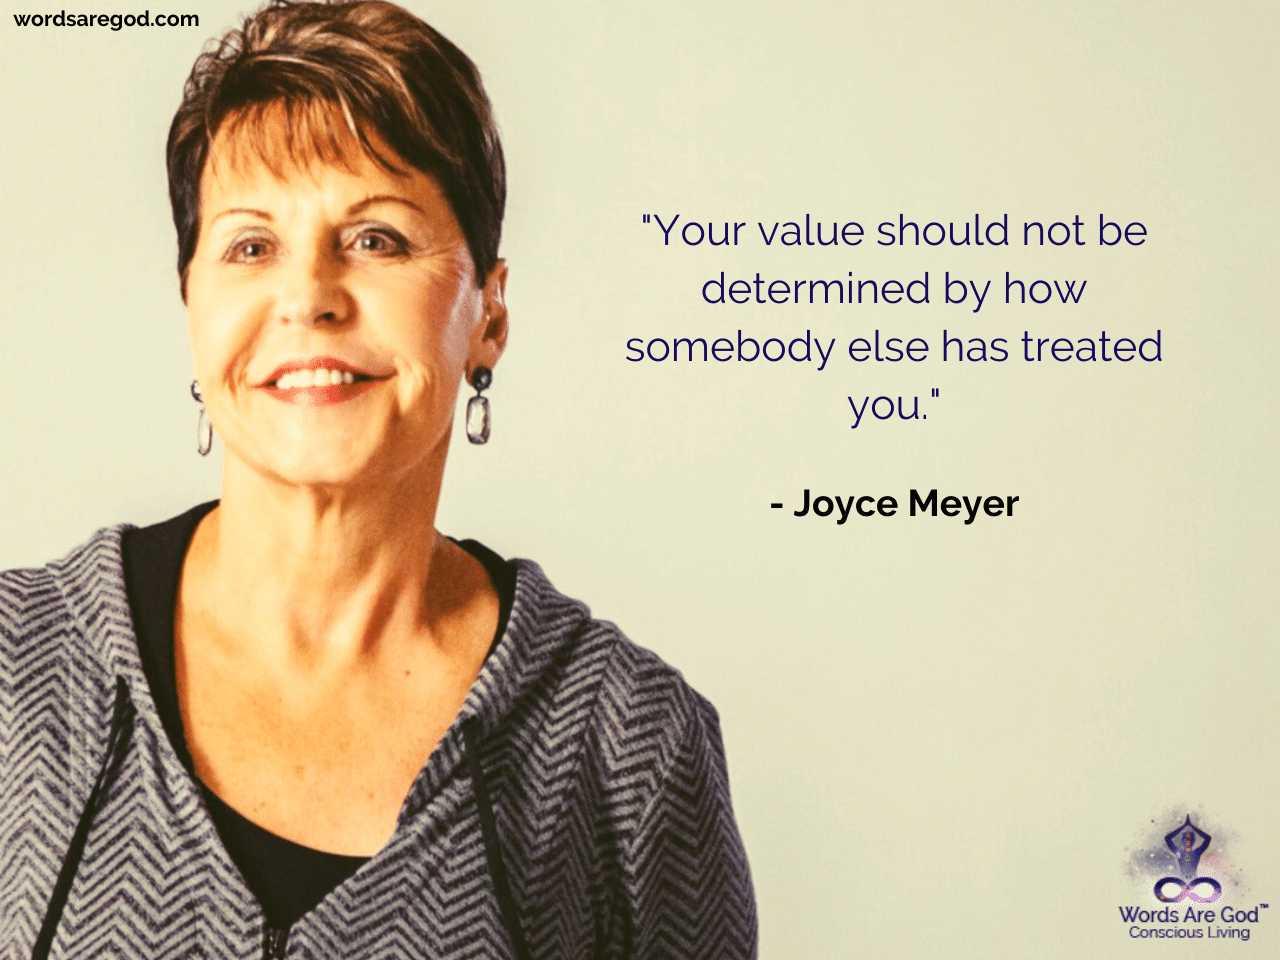 Joyce Meyer Best Quote